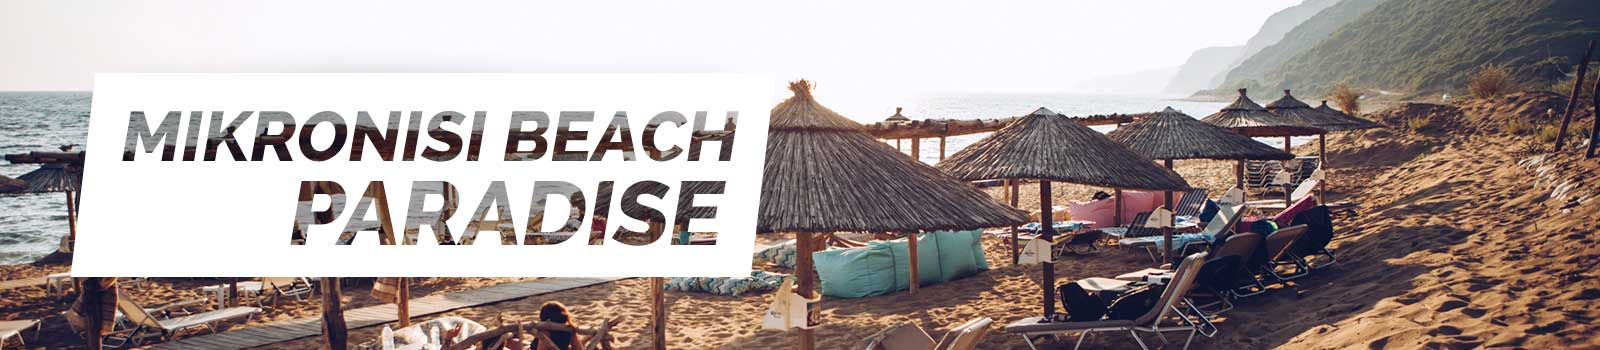 corfu-b8-mikronisi-beach-paradise